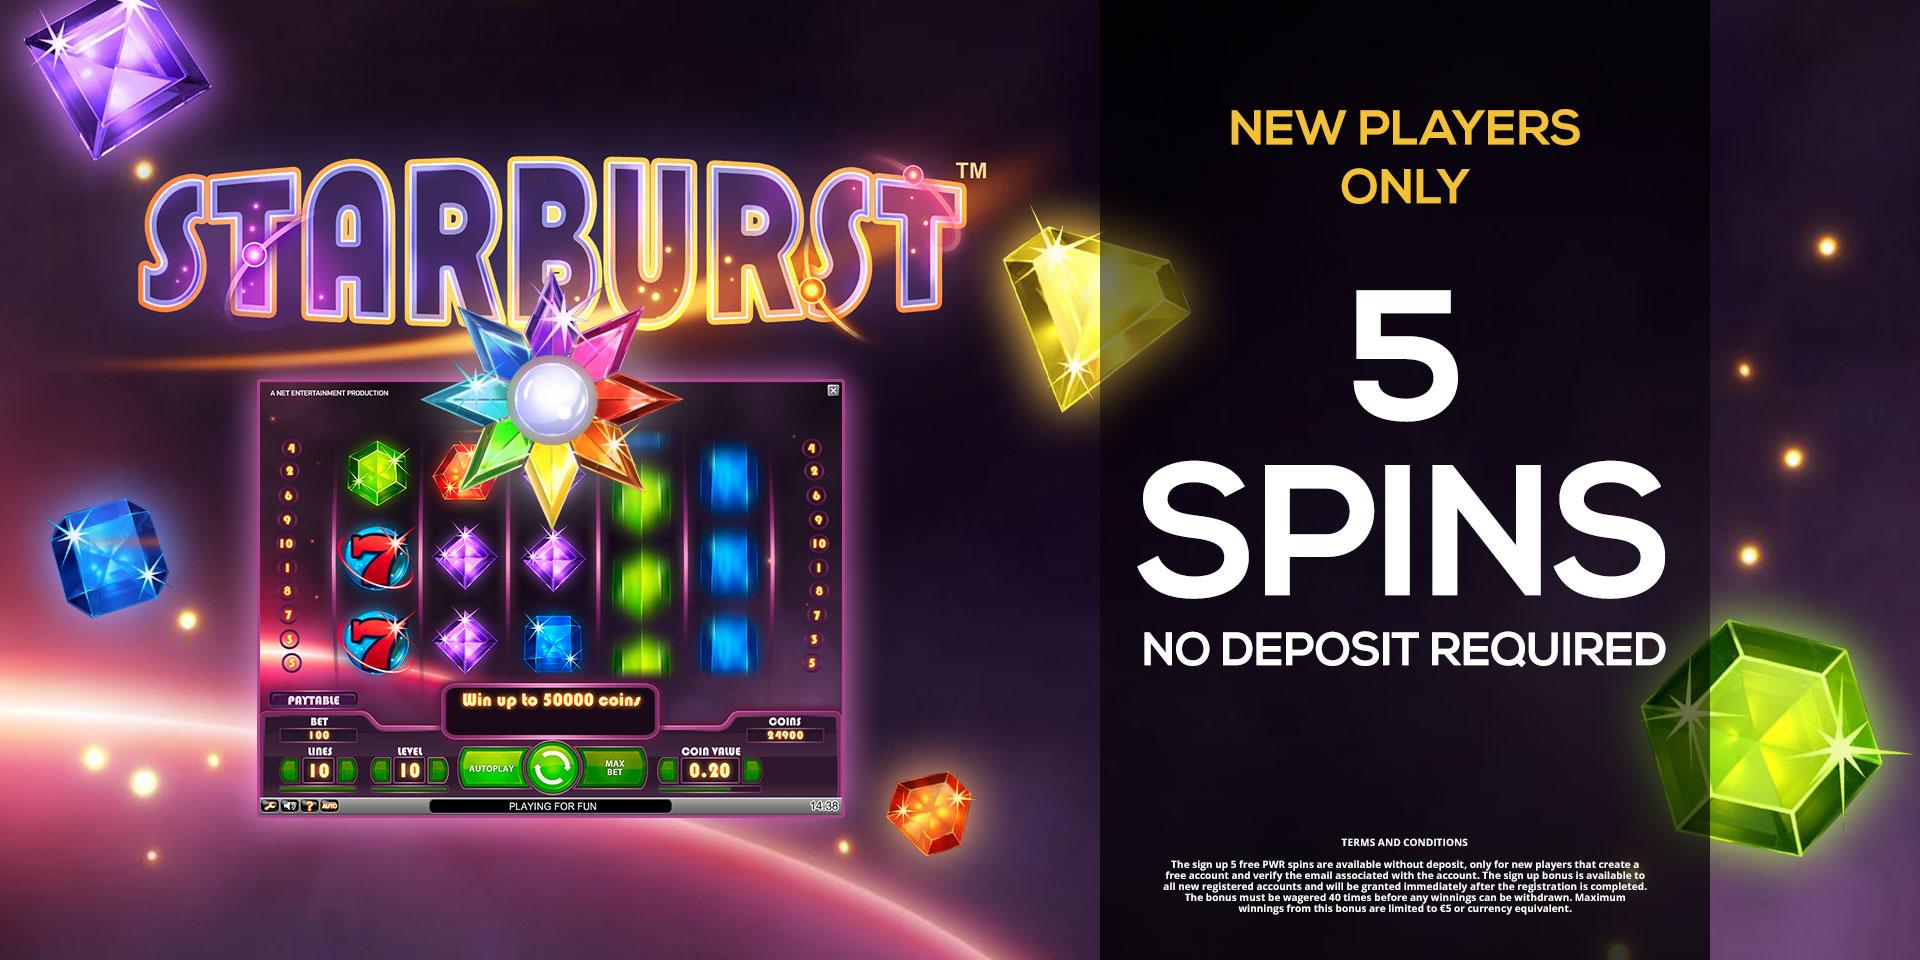 Free Spins Casino Bonus With No Deposit Required